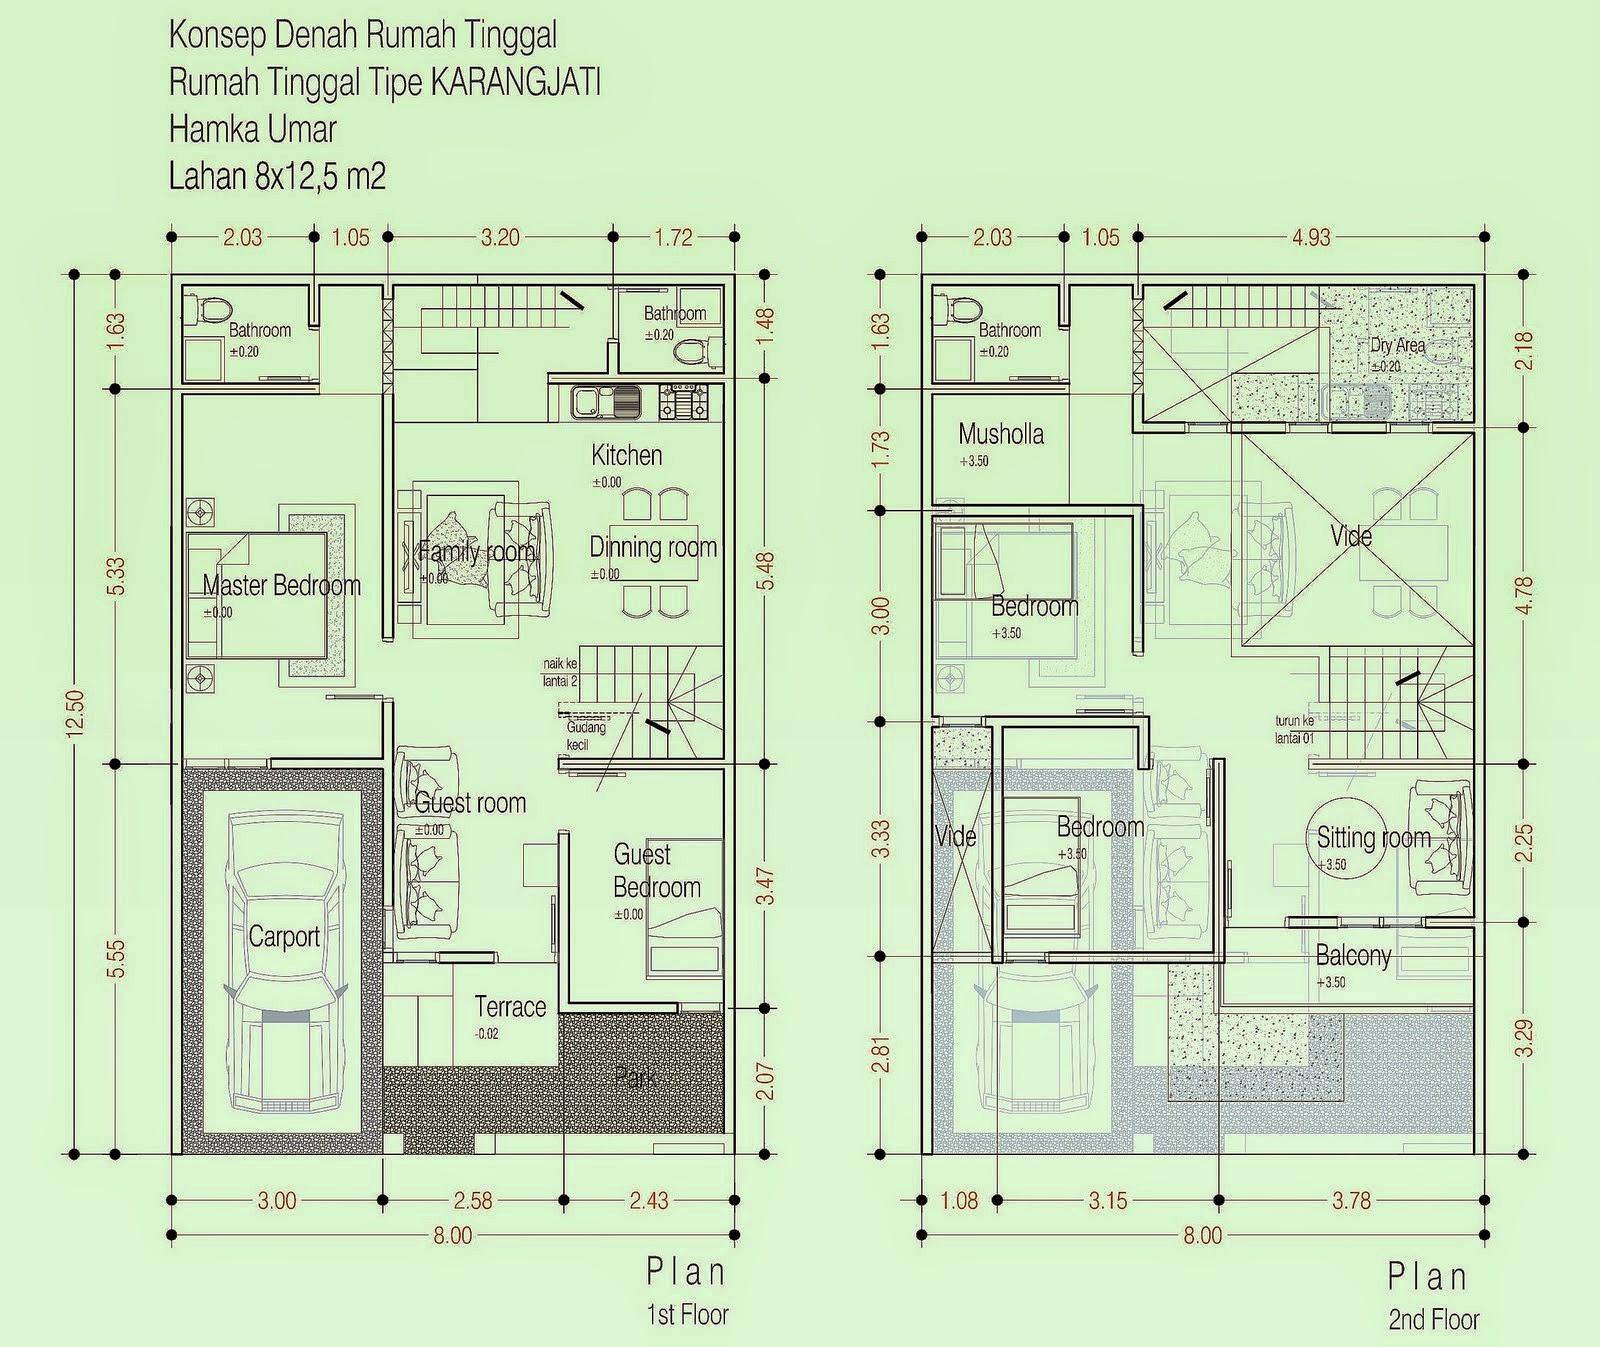 67 Desain Rumah Minimalis 2 Lantai Autocad Desain Rumah Minimalis